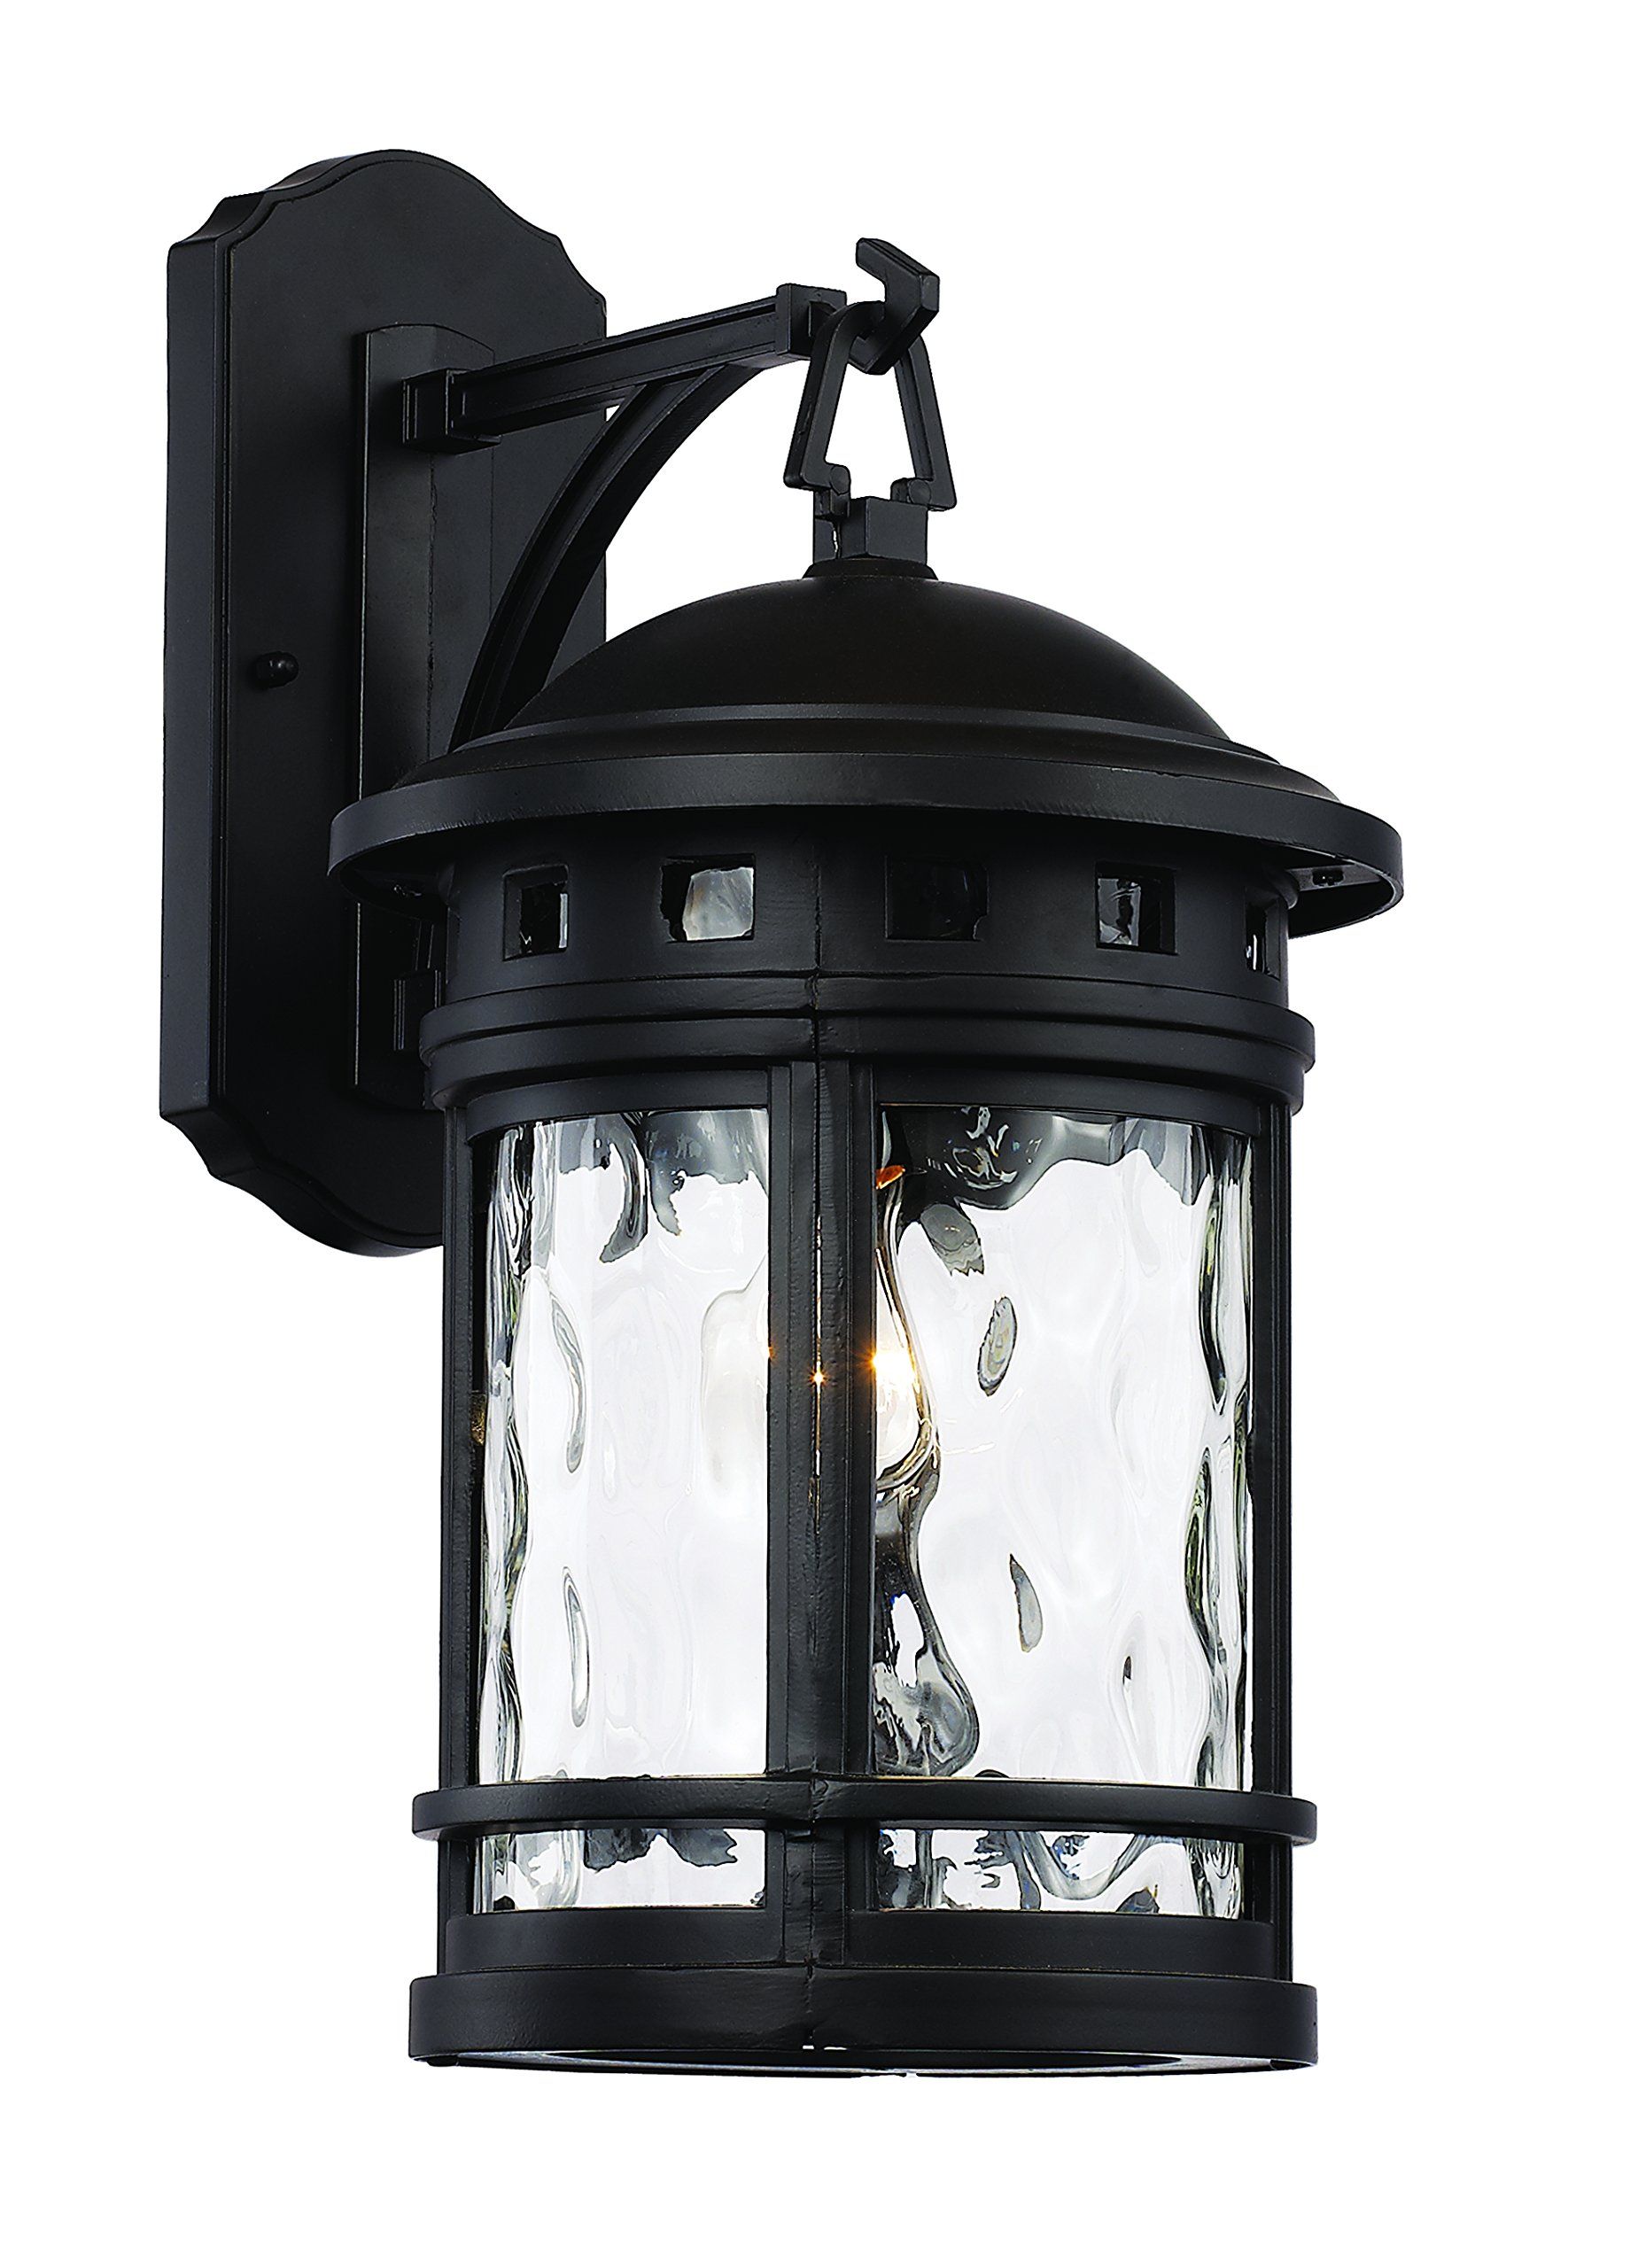 Trans Globe Lighting 40371 BK Outdoor Boardwalk 16.25'' Wall Lantern, Black